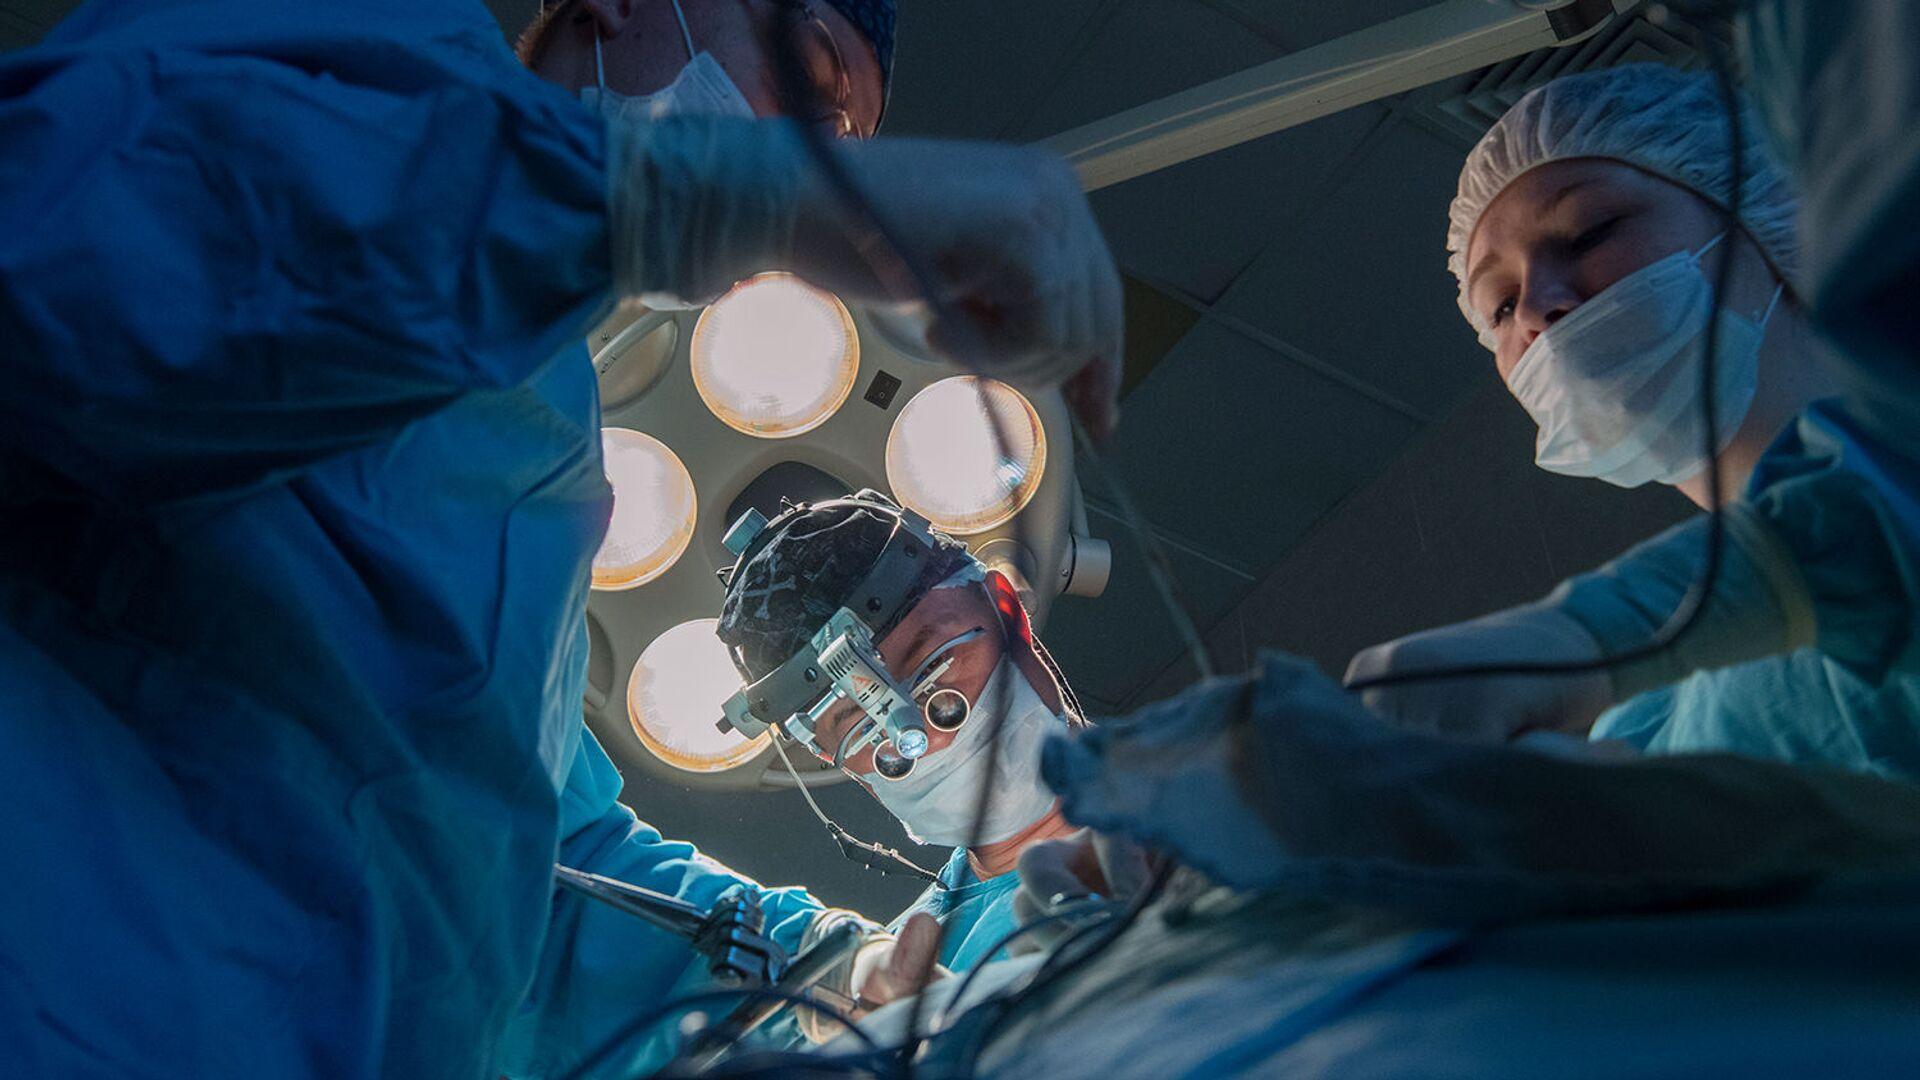 Хирурги проводят операцию - РИА Новости, 1920, 17.06.2021